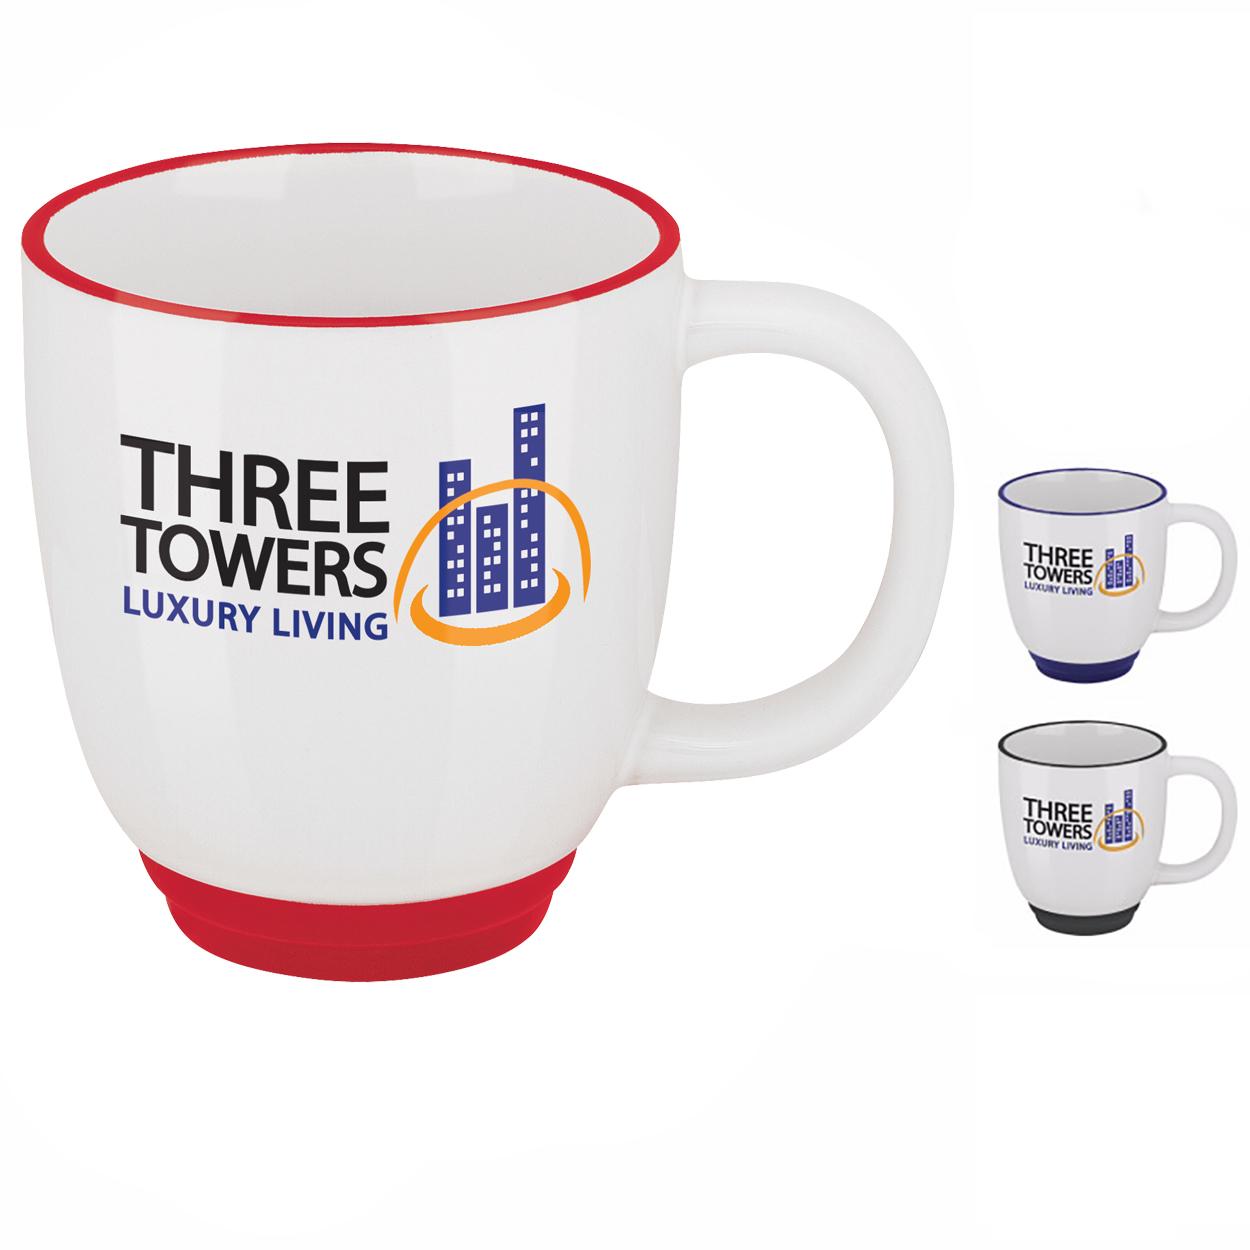 14 Oz. Two-Tone Bistro Mug - 1 Colour Imprint, #45127